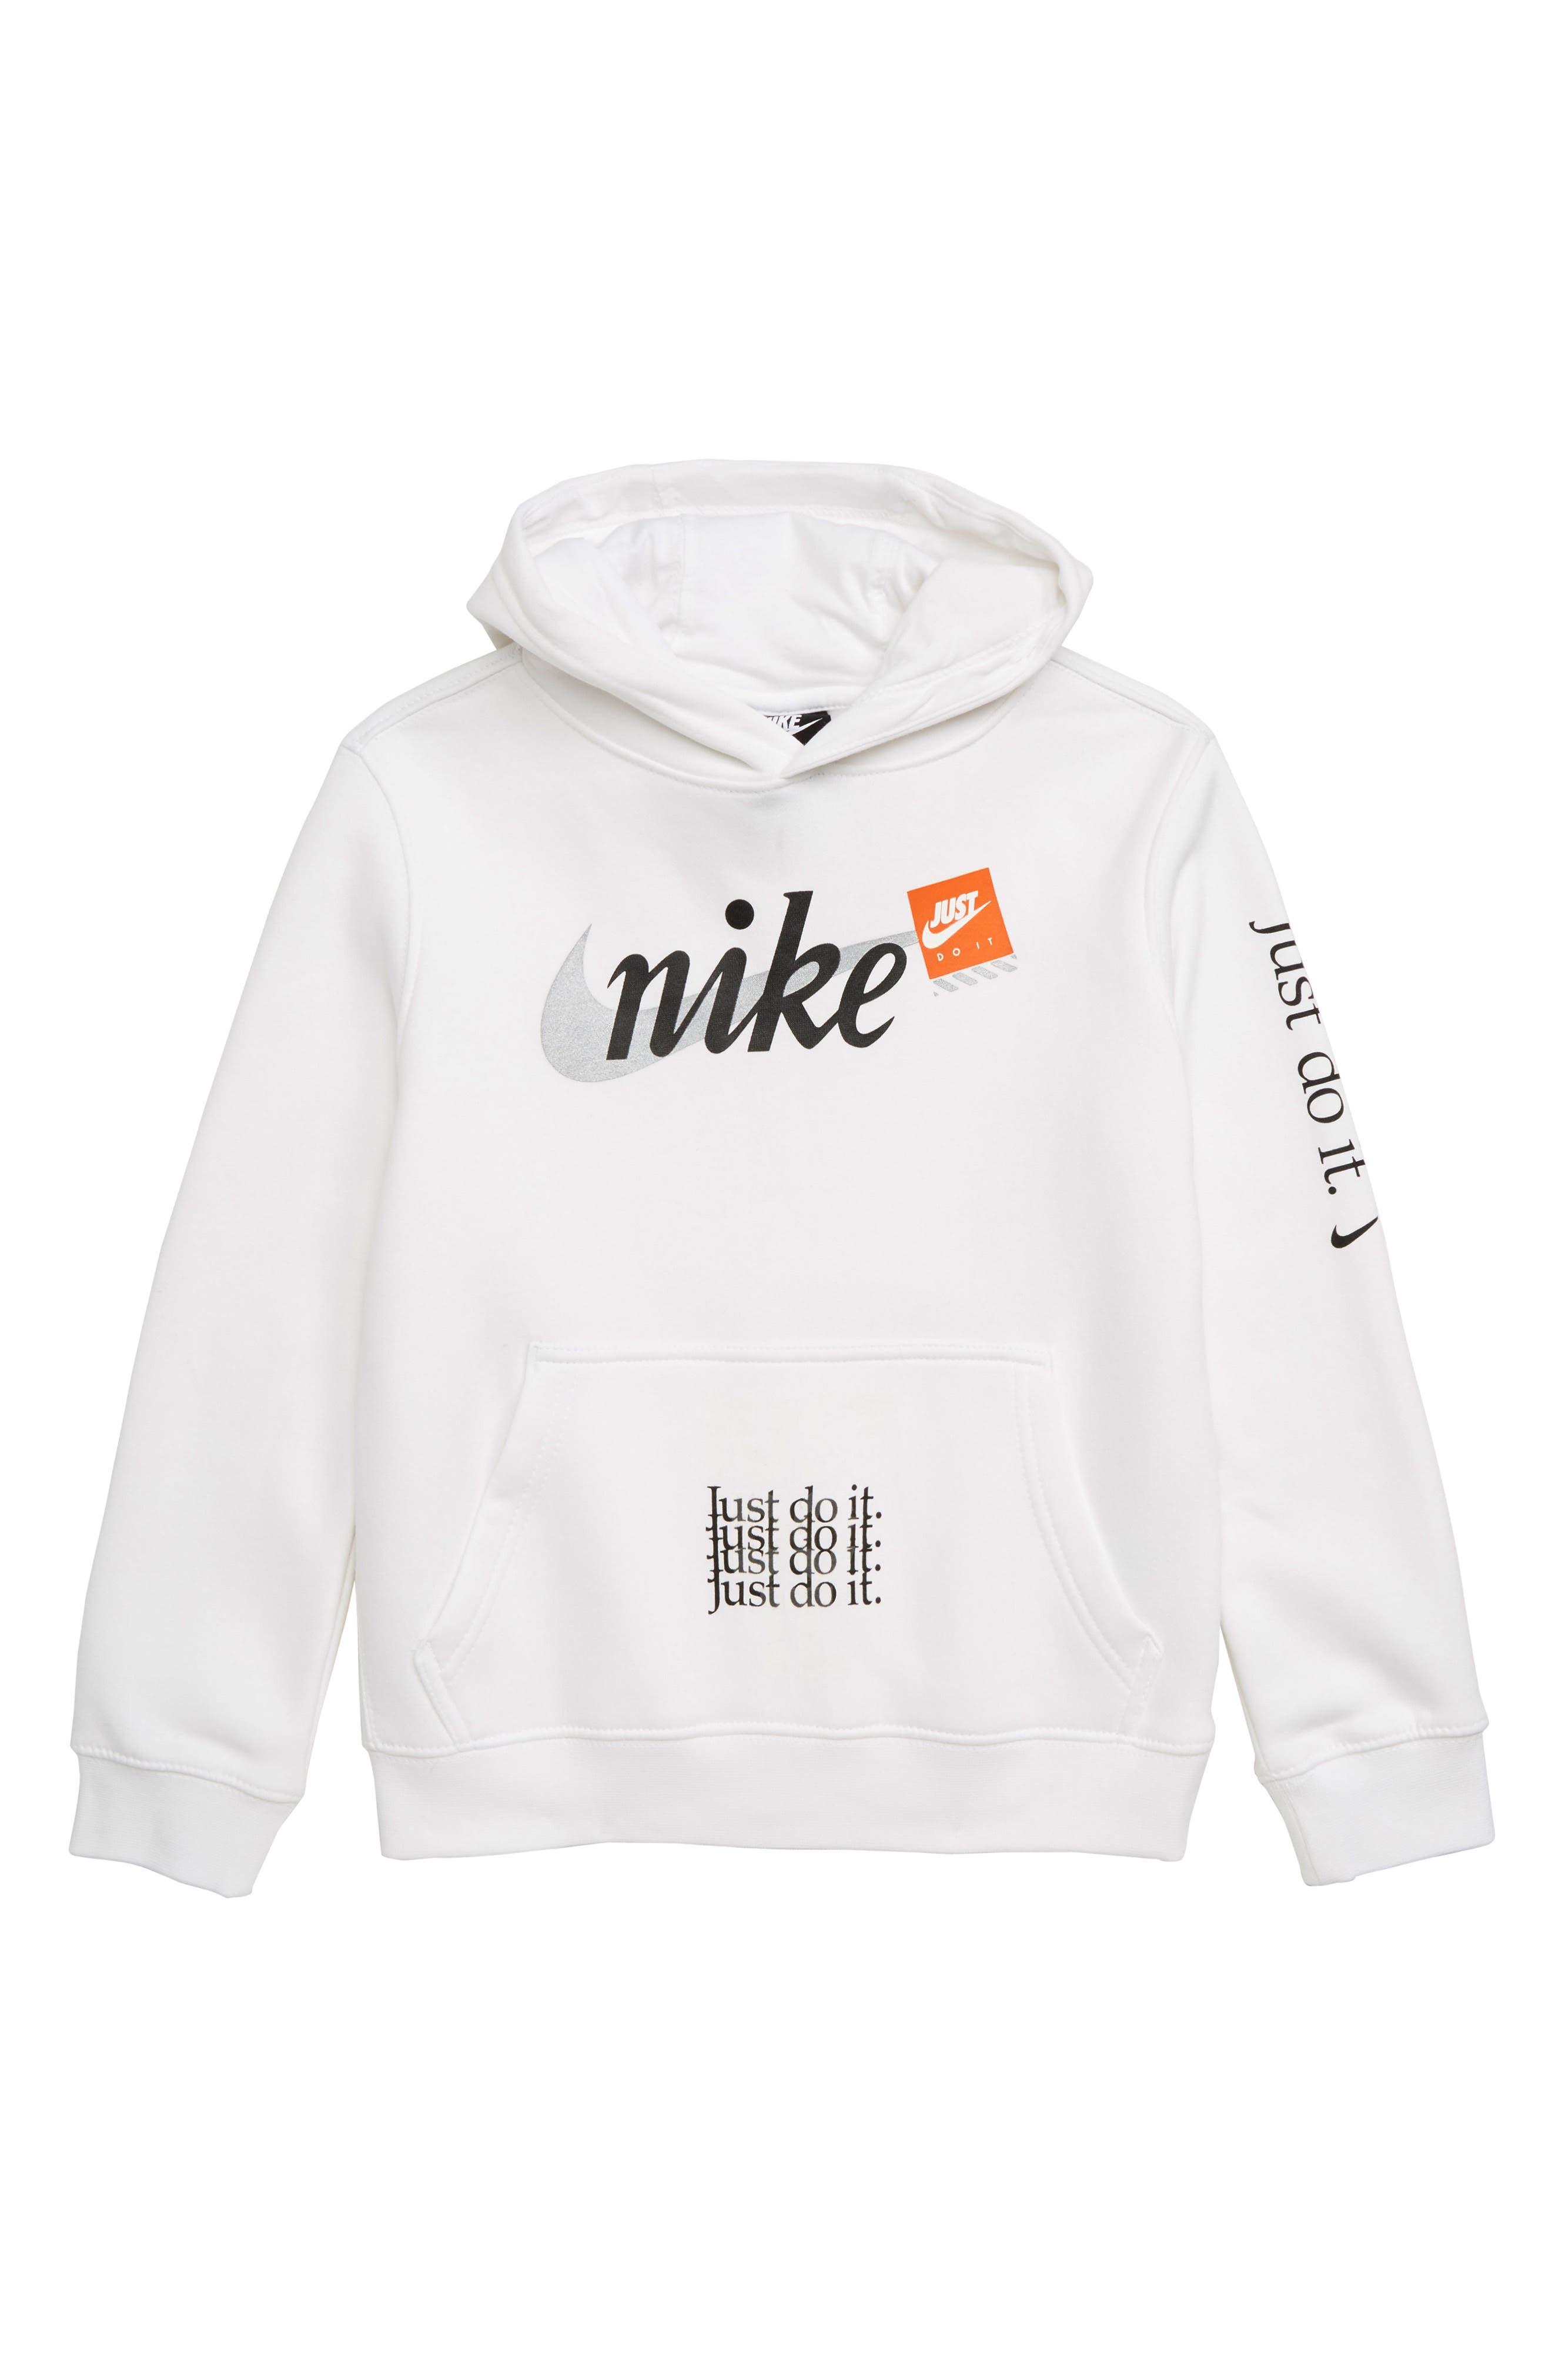 Boys Nike Just Do It Hooded Sweatshirt